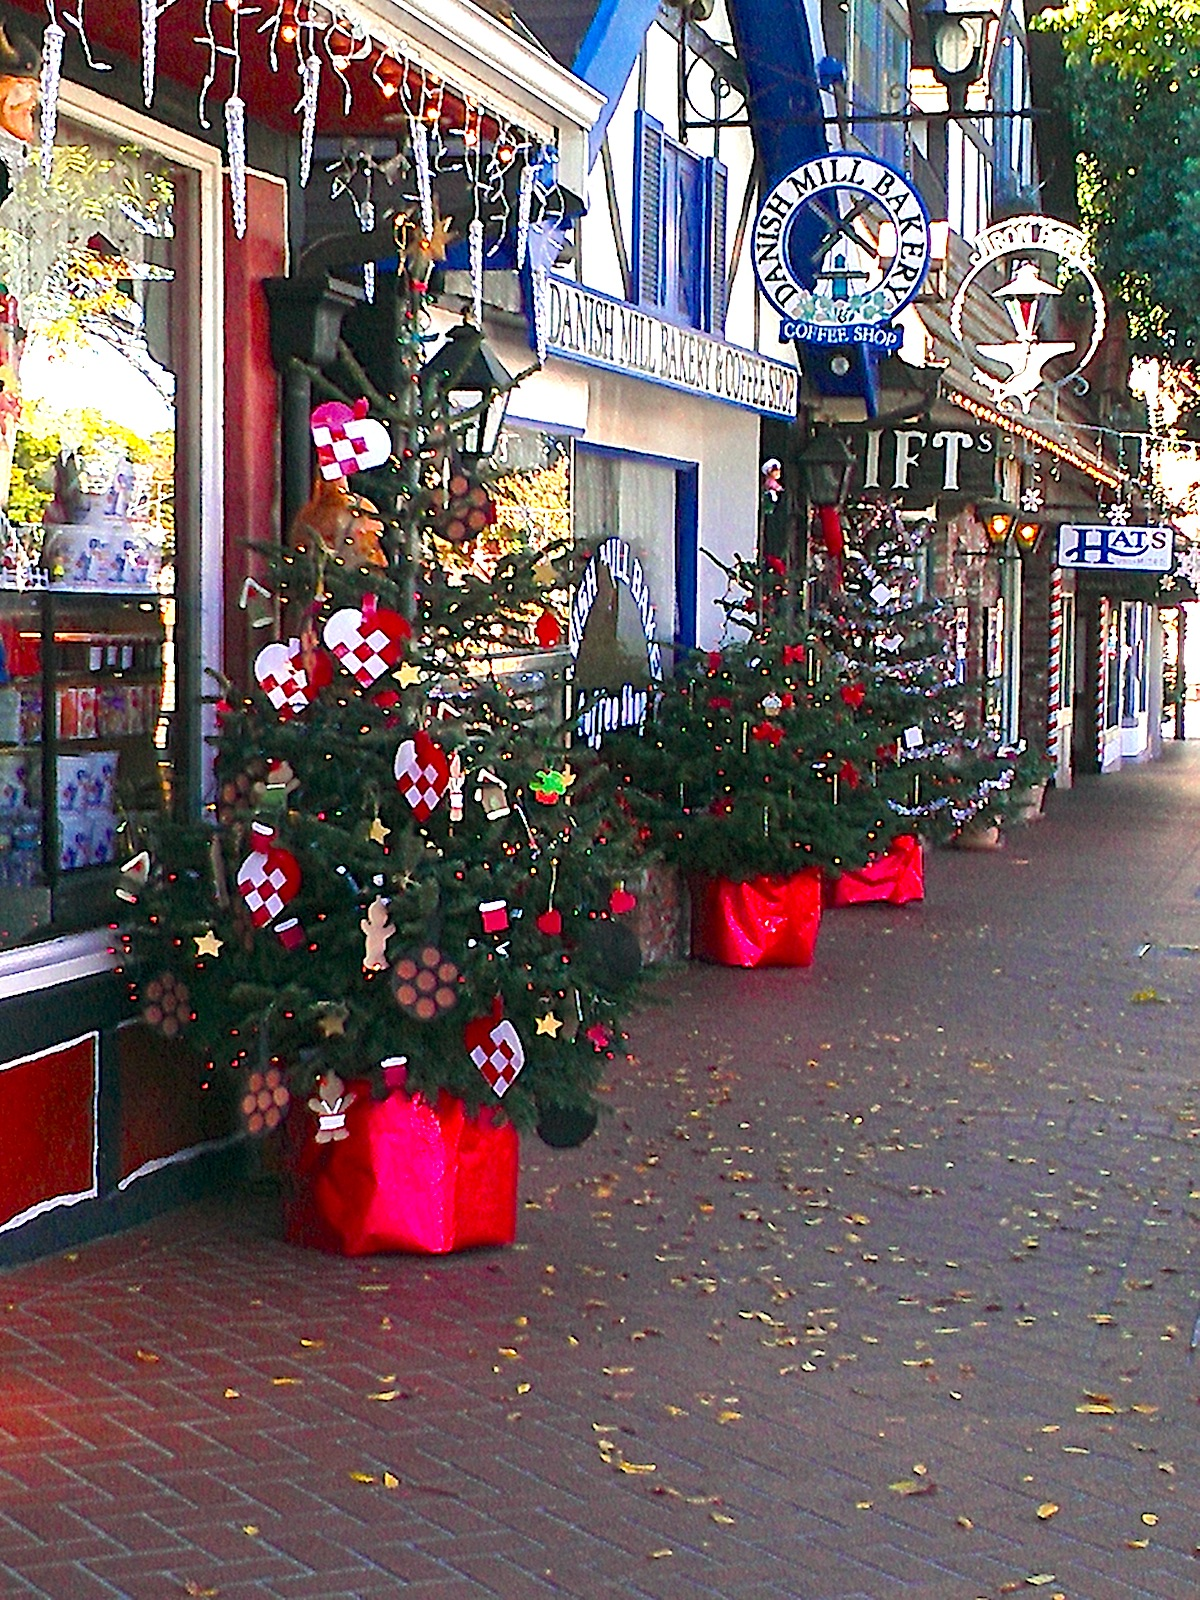 Street Downtown Restaurants 7th